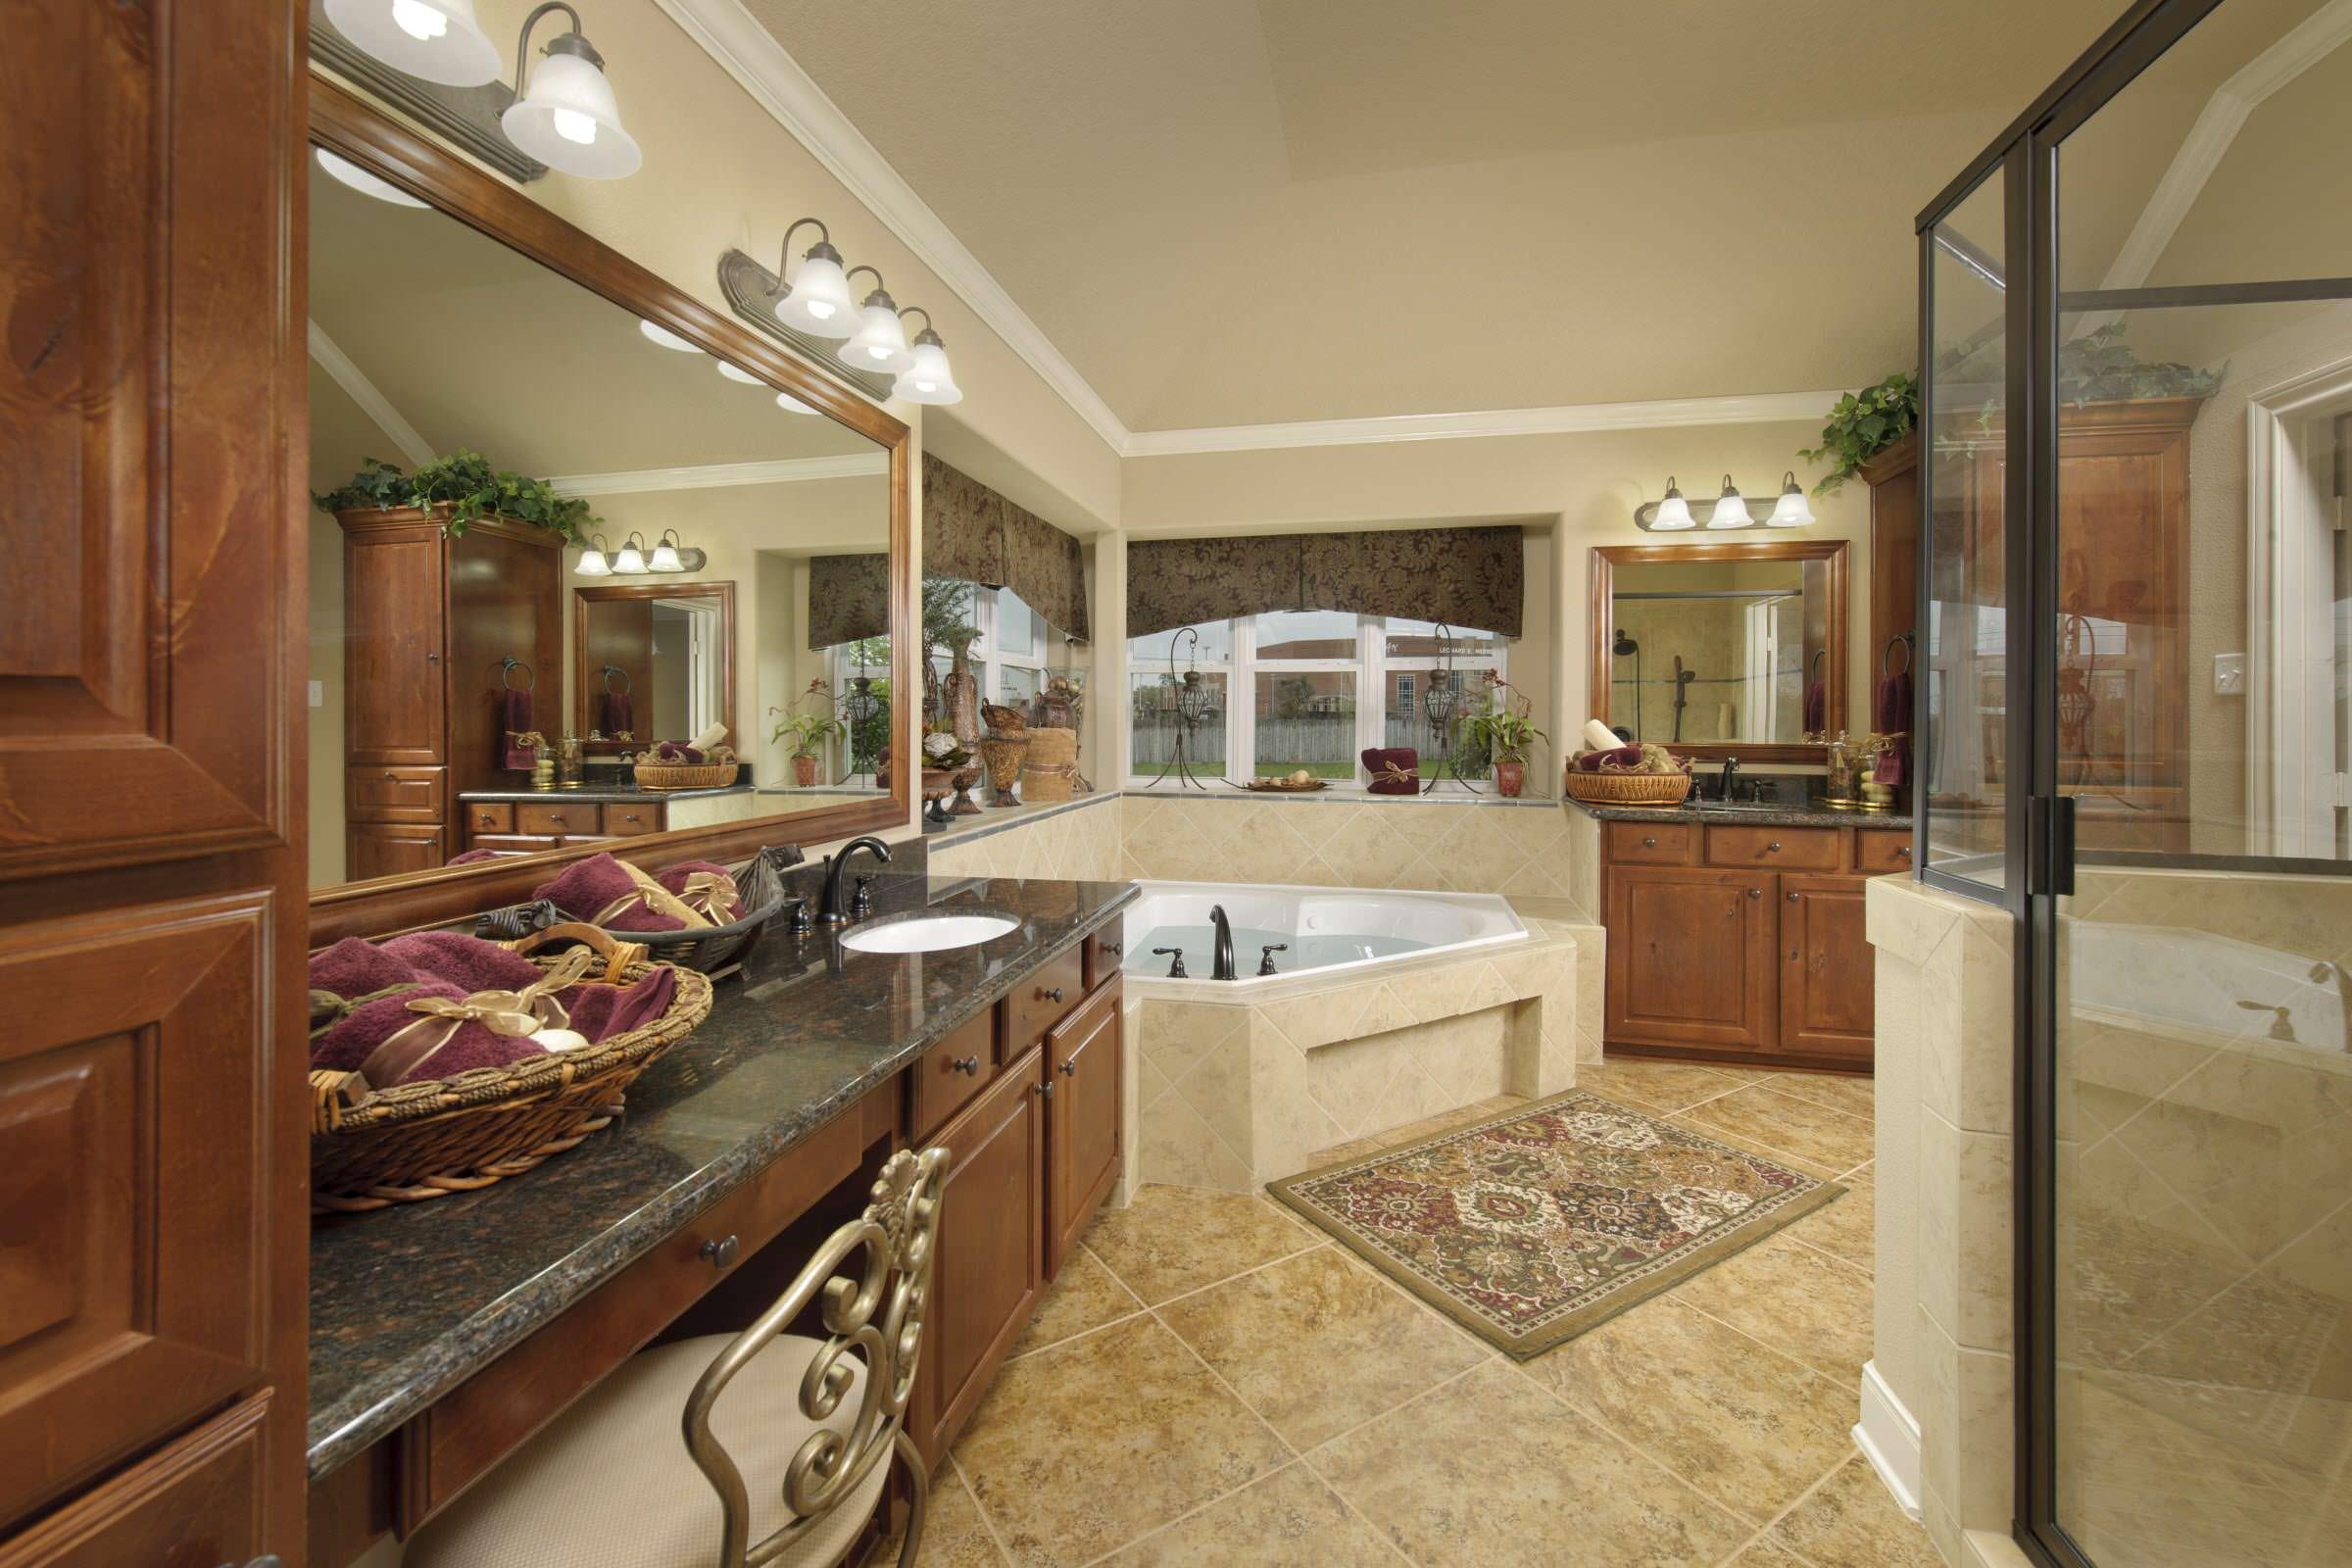 75 beautiful travertine floor bathroom